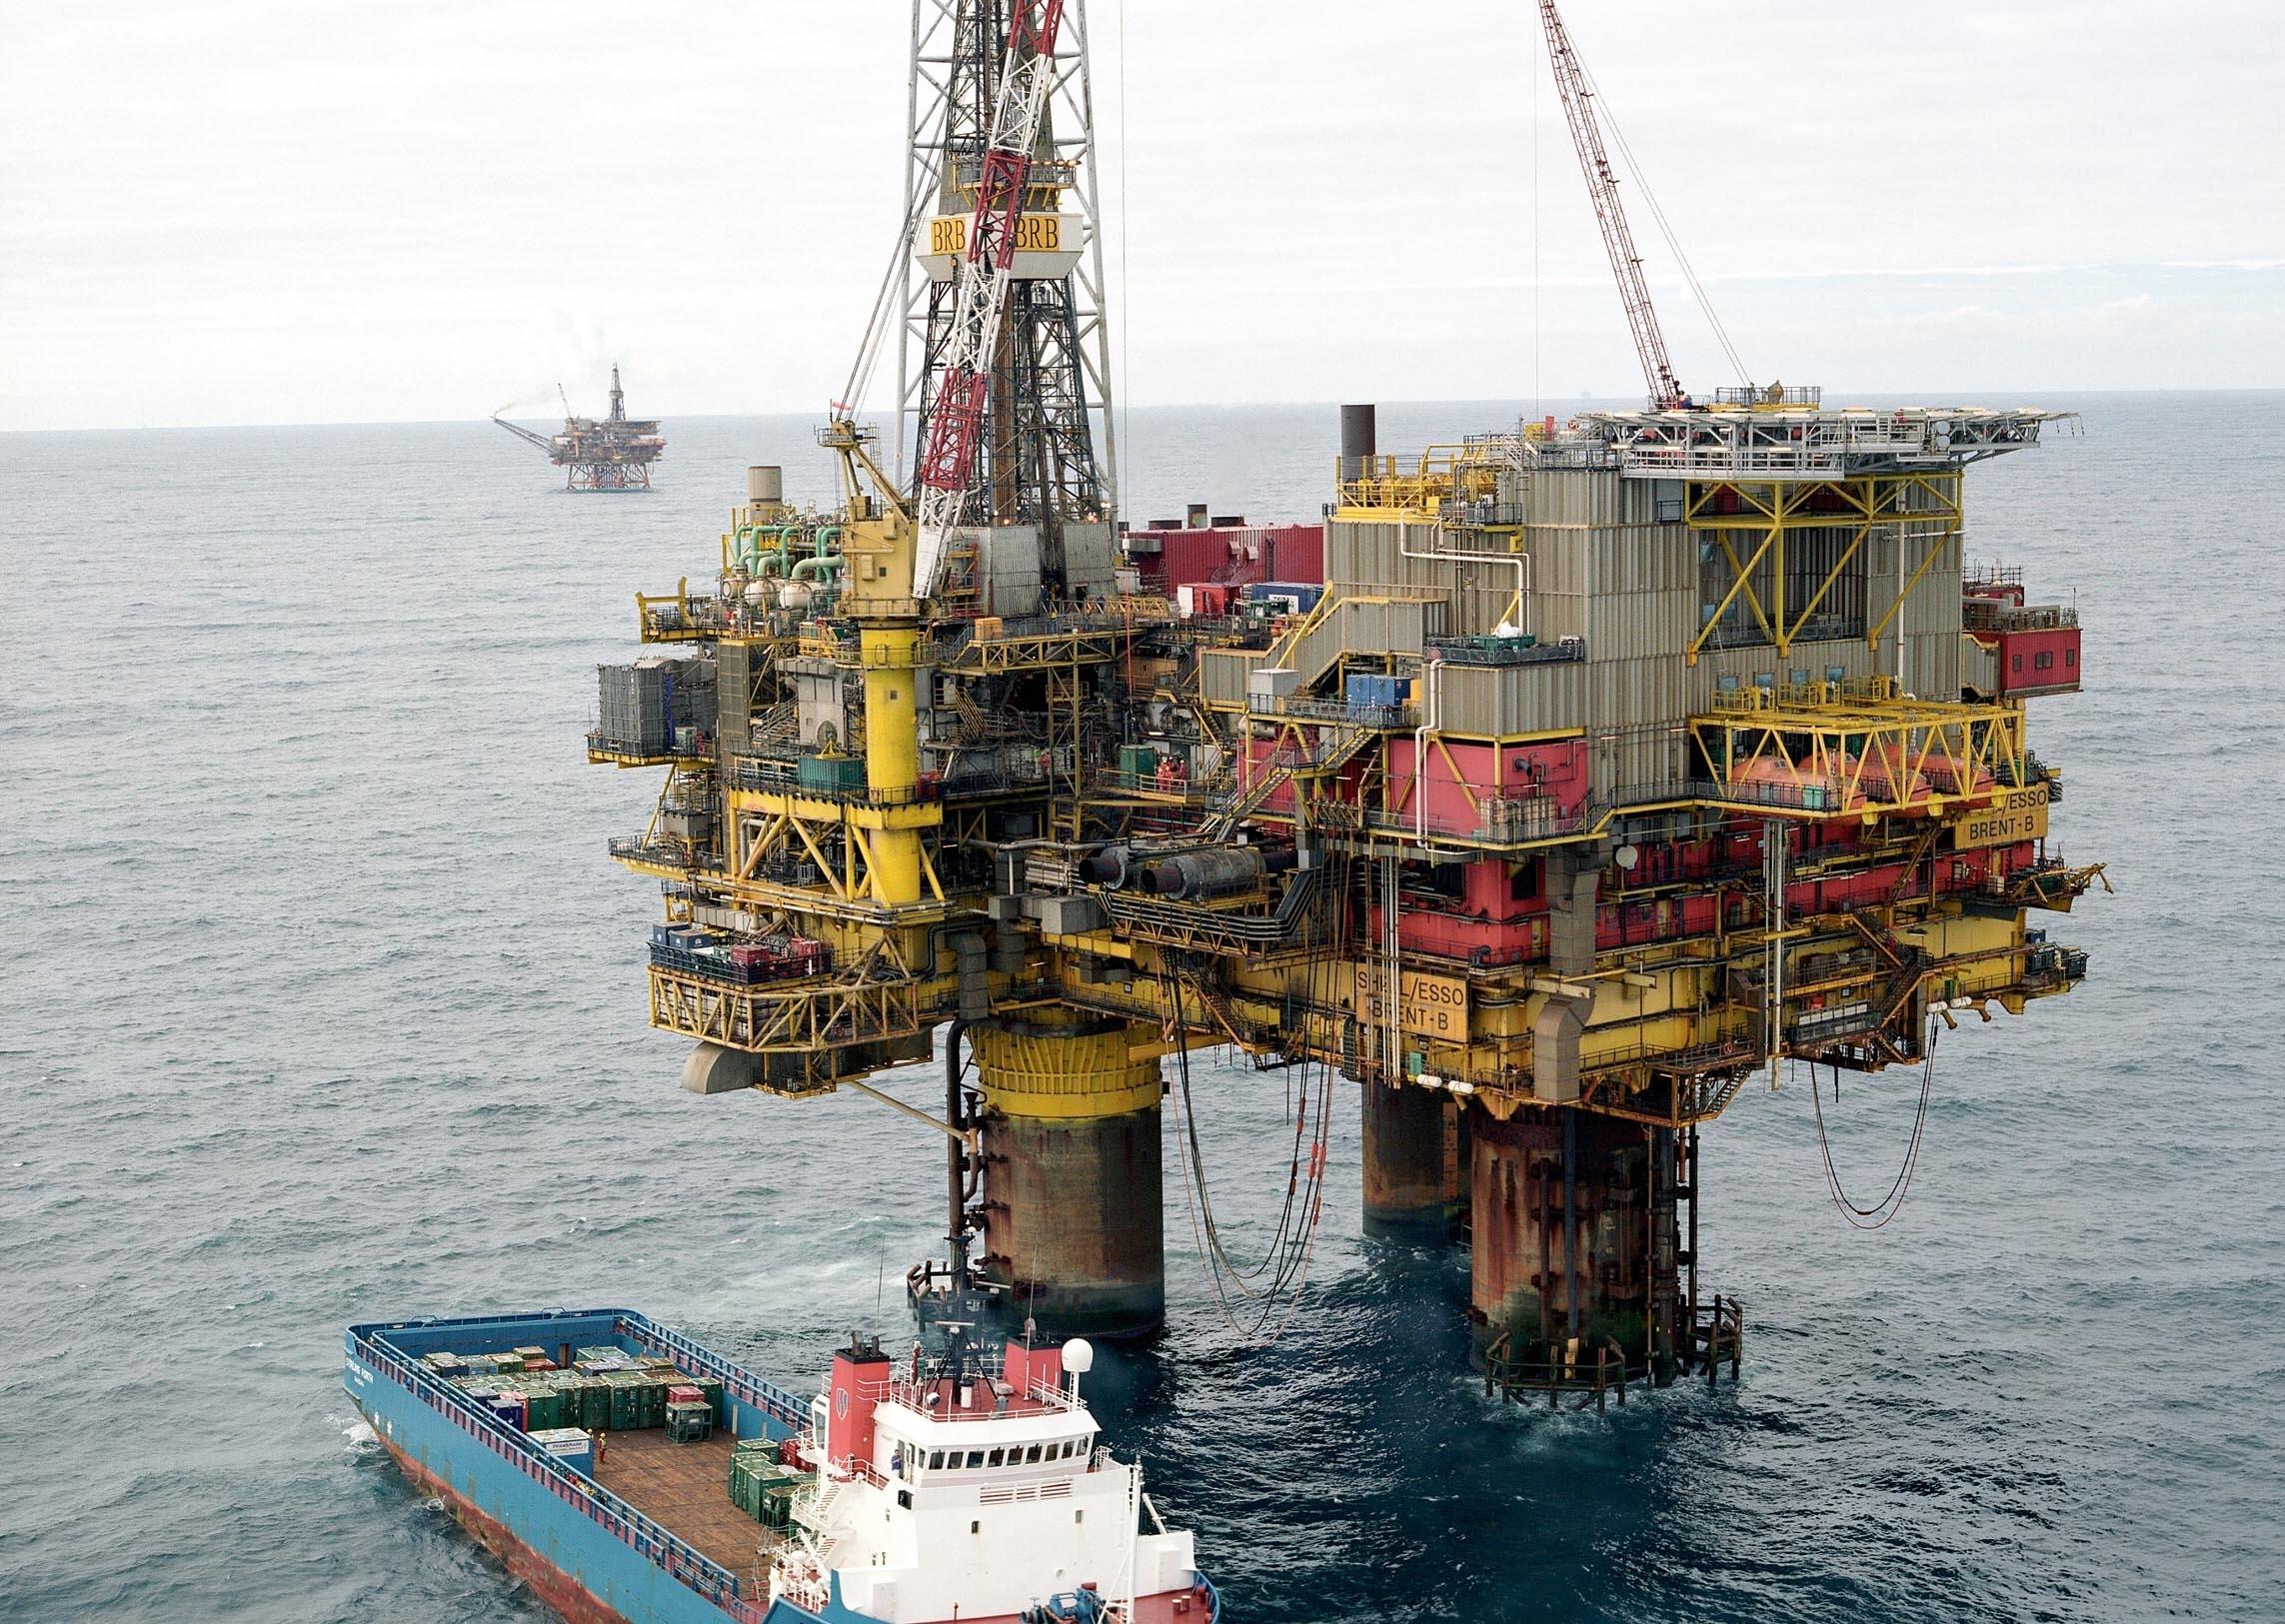 Shell's Brent Bravo platform